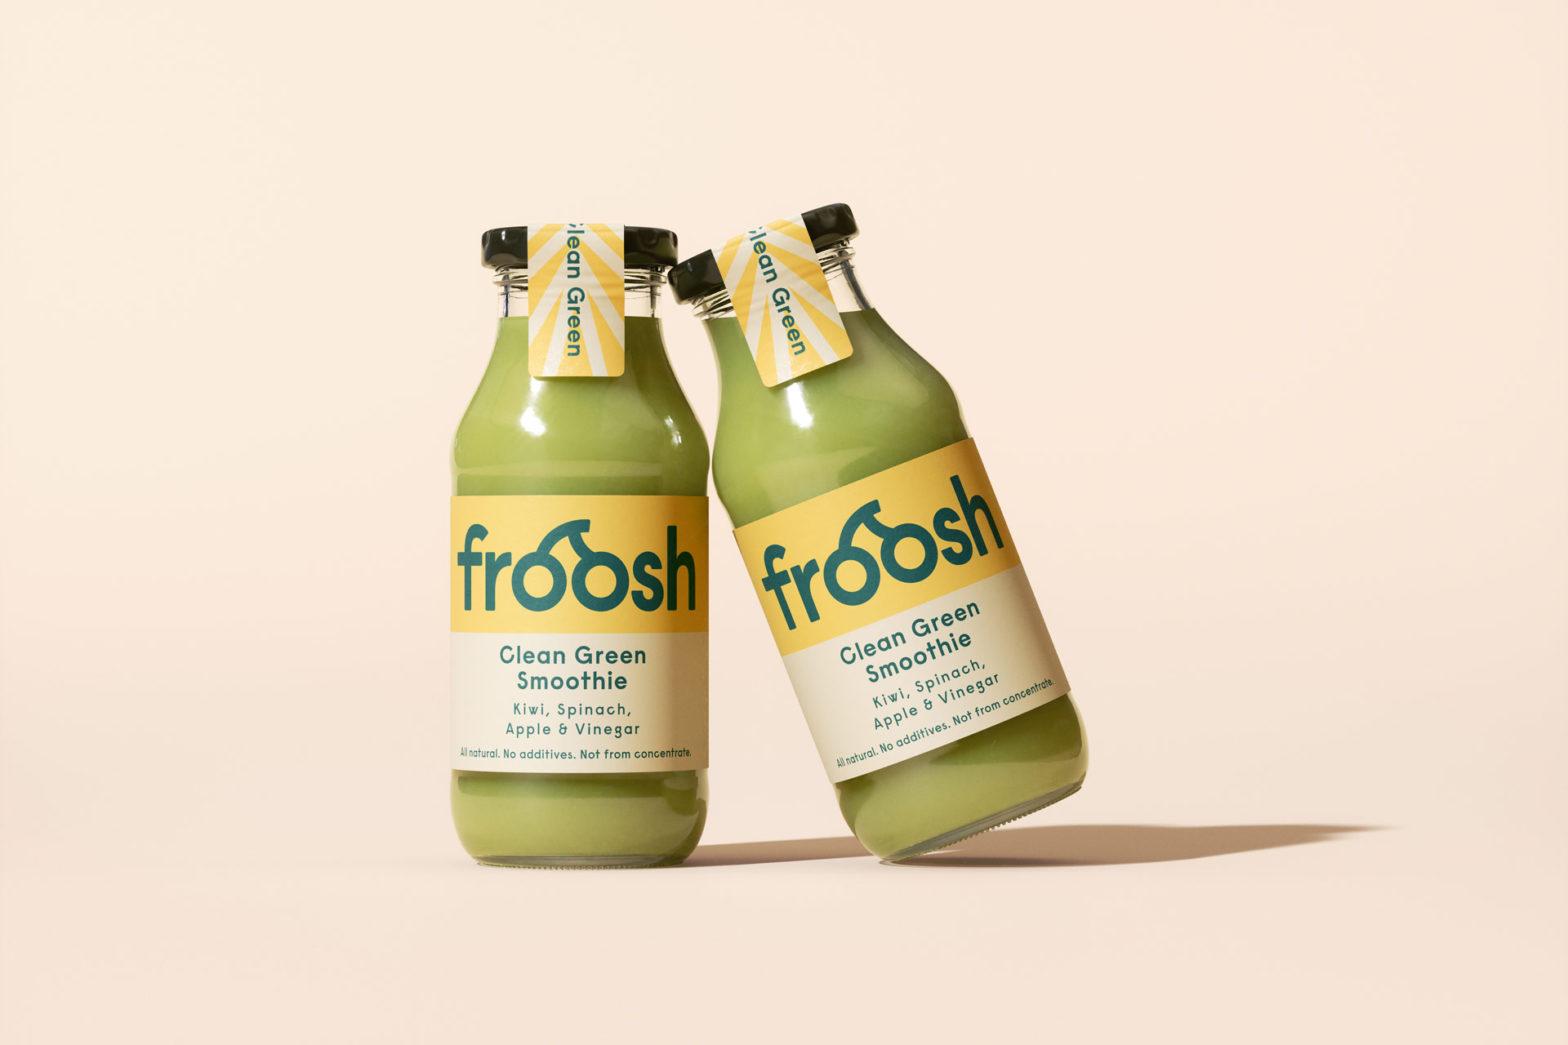 Tidning hyllar smoothie från Fazer